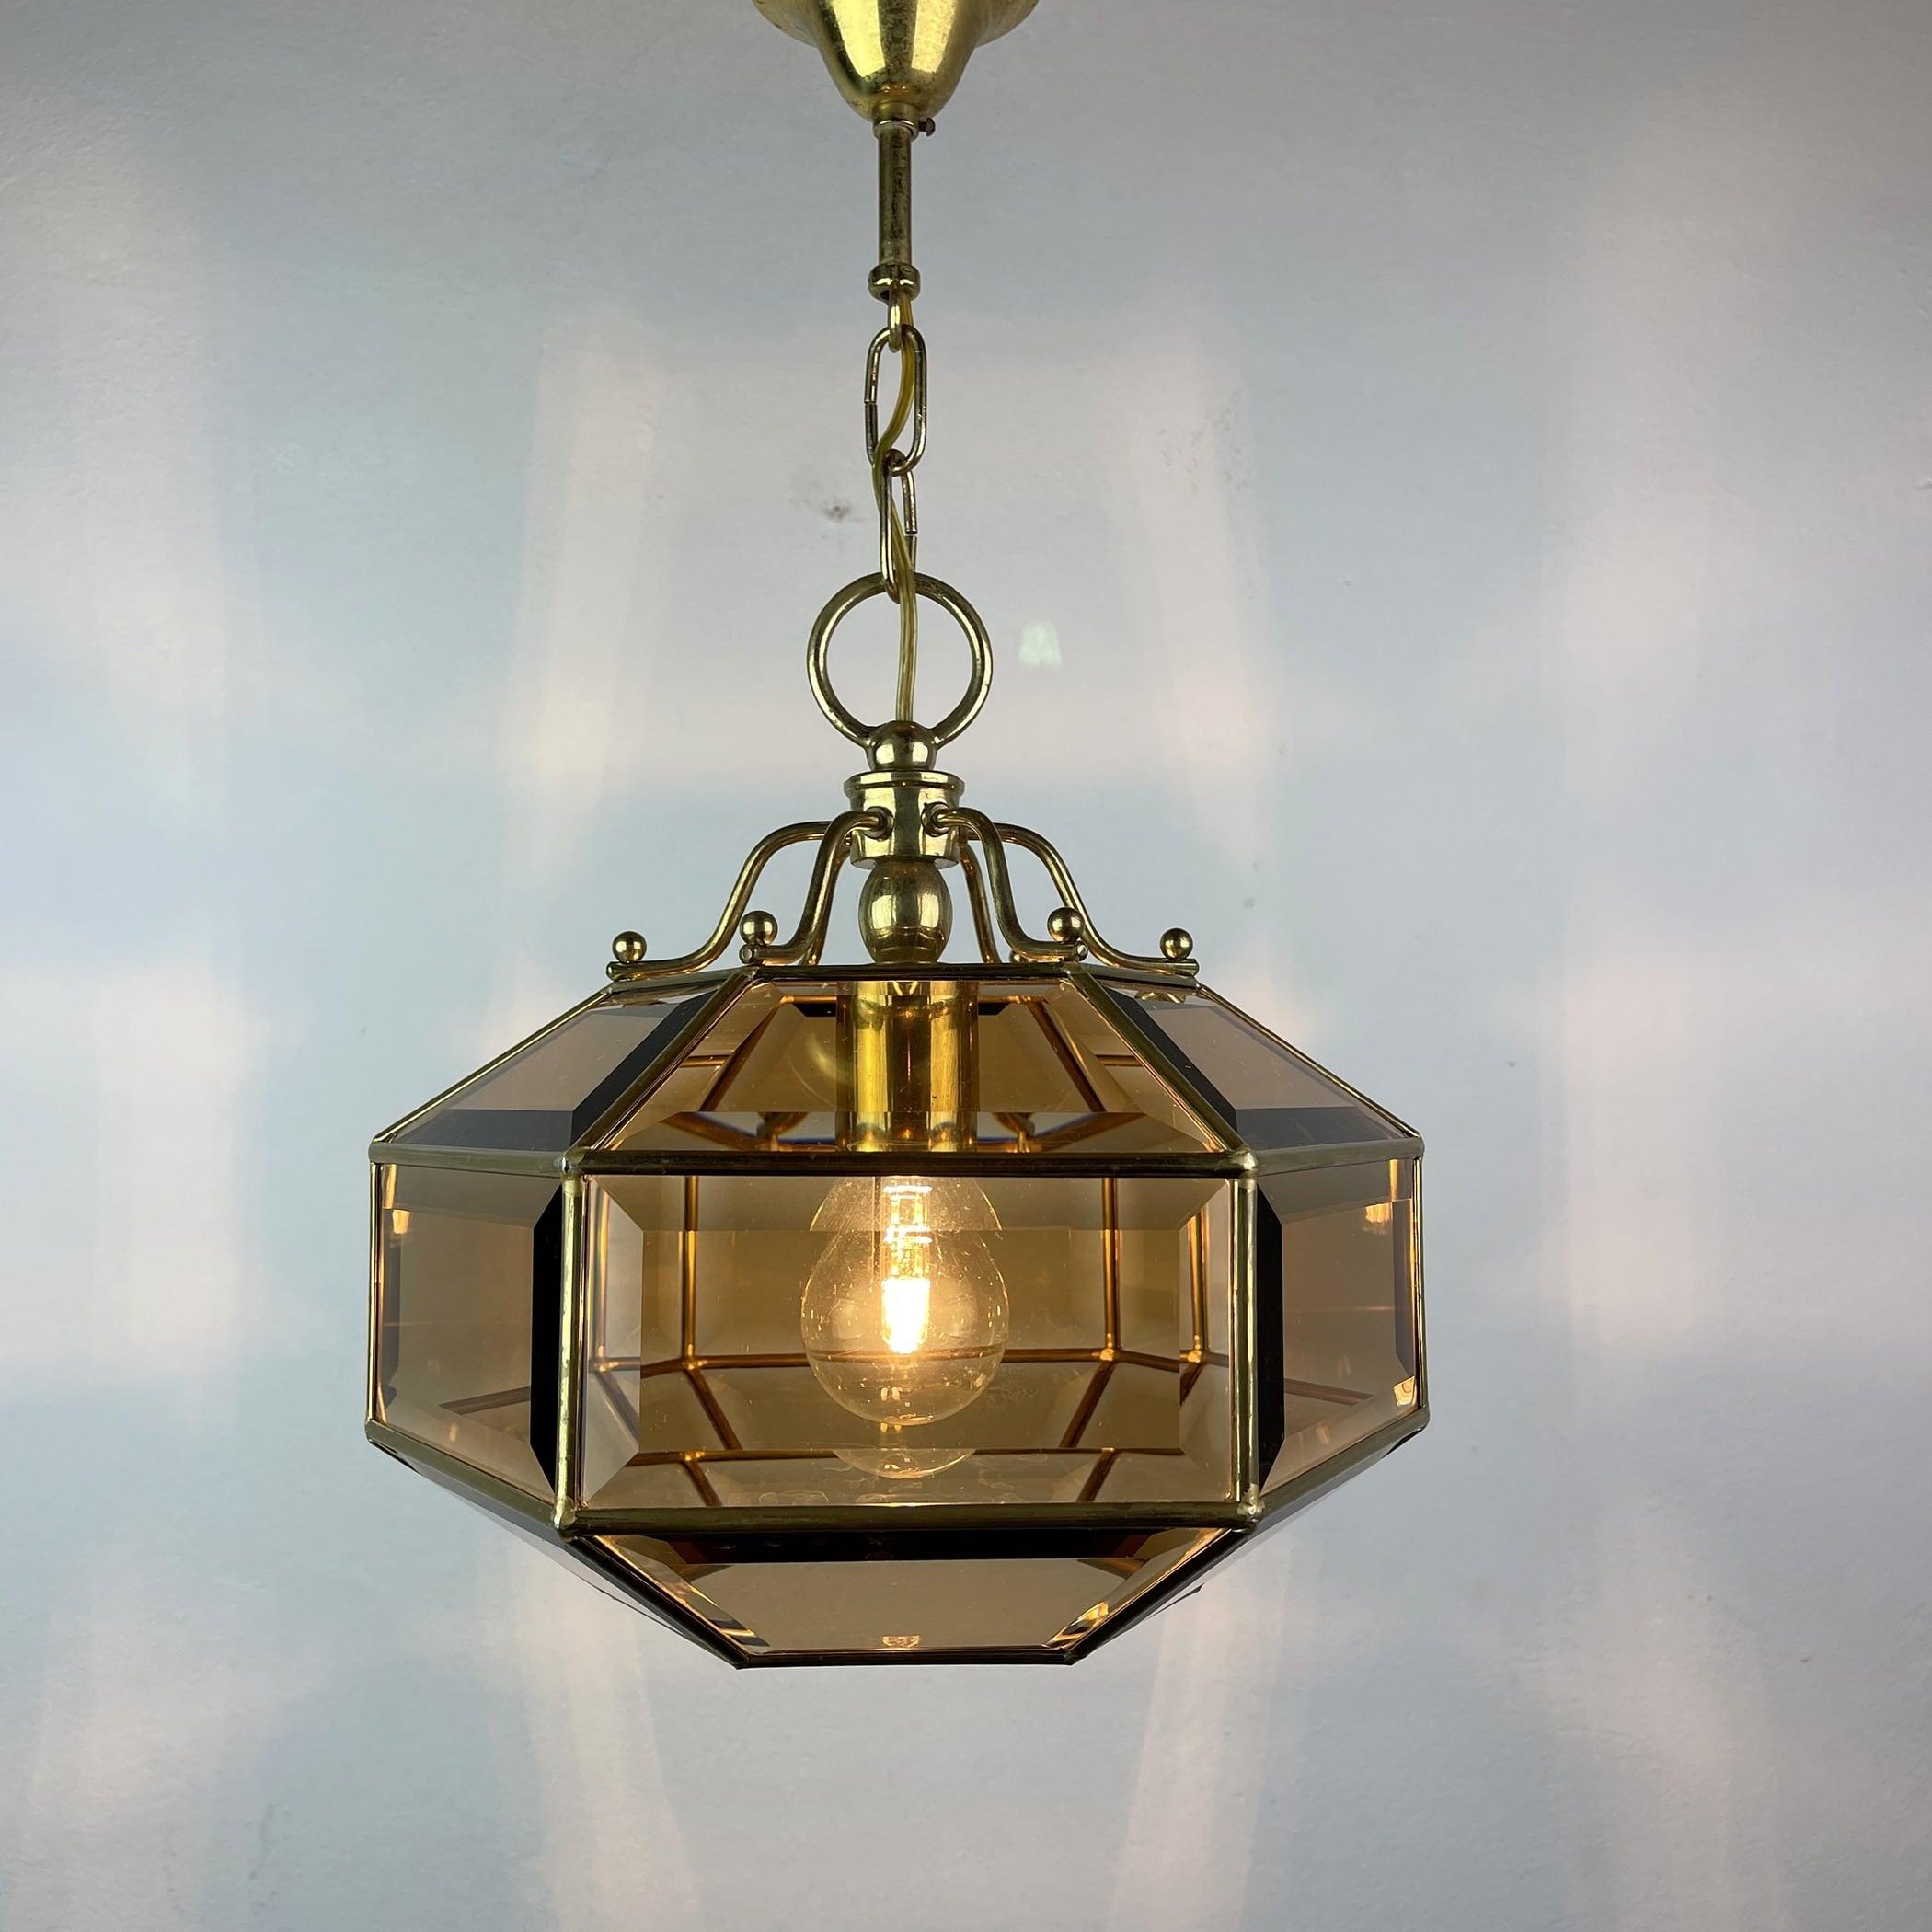 Vintage diamond pendant lamp Italy 1960s Gold brass hex crystal lamp